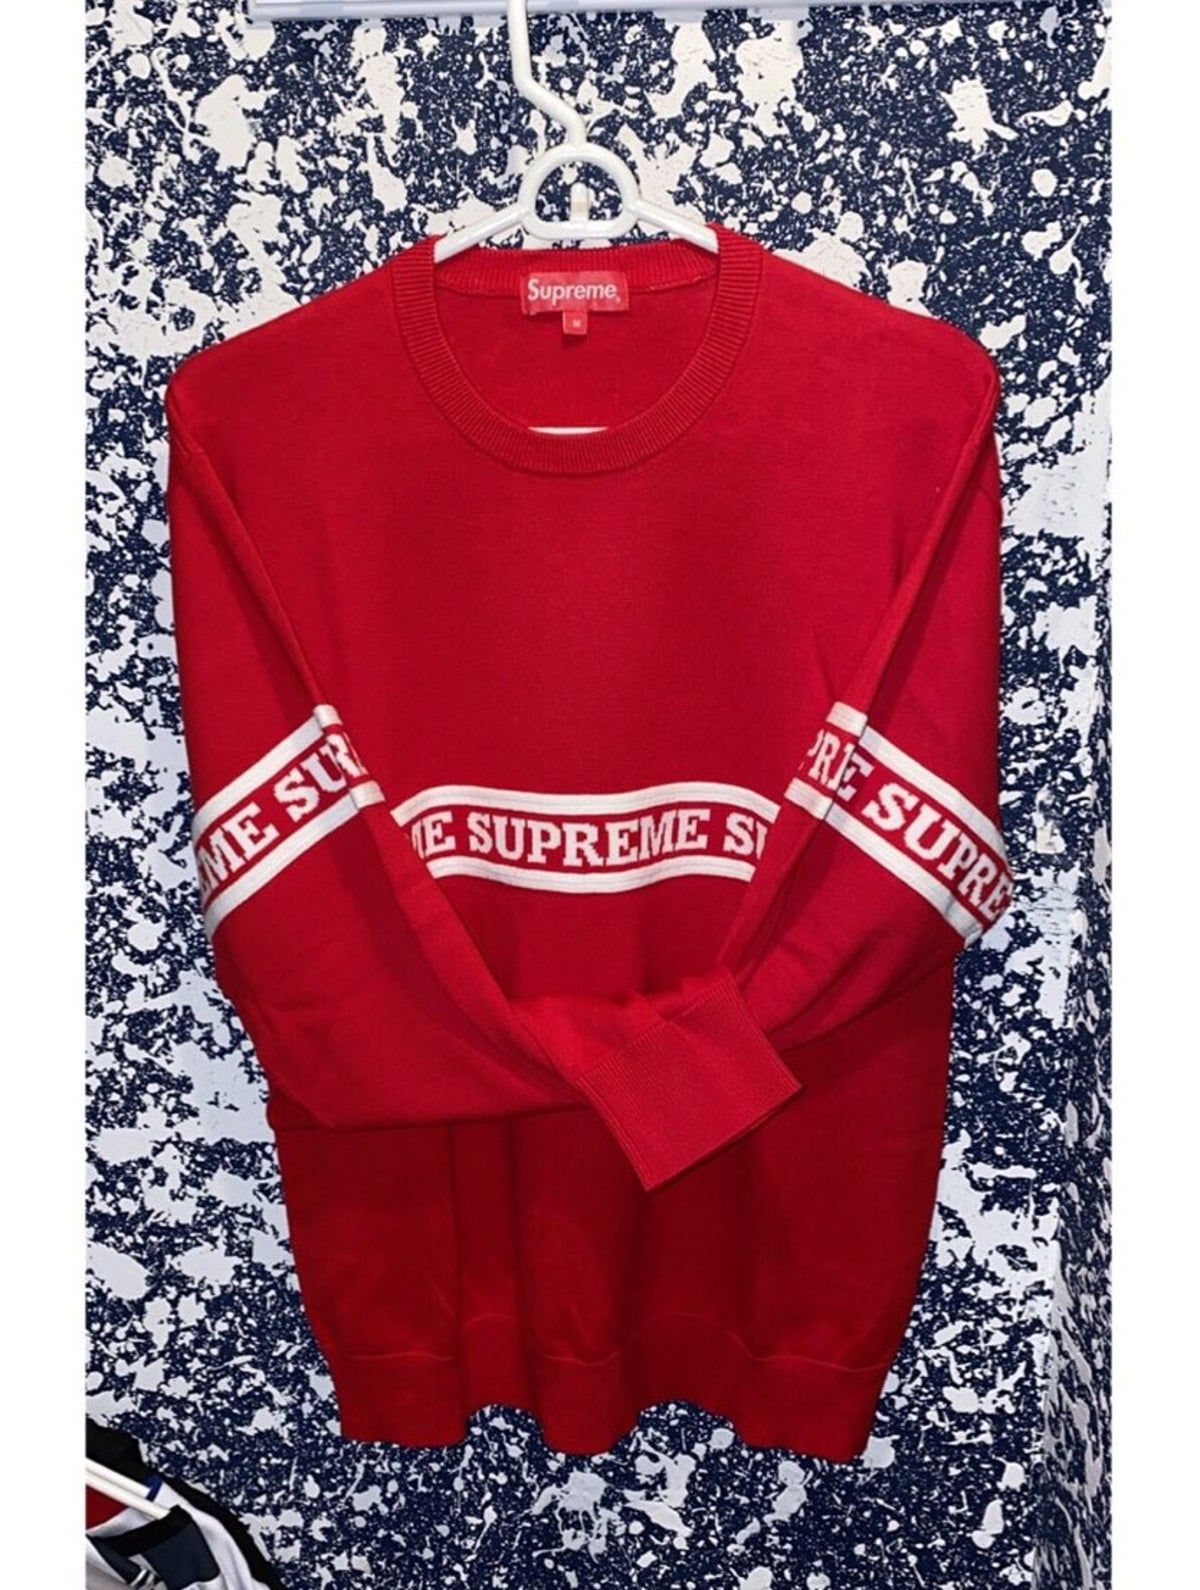 Supreme Knit Sweater Long Sleeve Tshirt Men Mens Street Style Mens Sweatshirts [ 1590 x 1200 Pixel ]